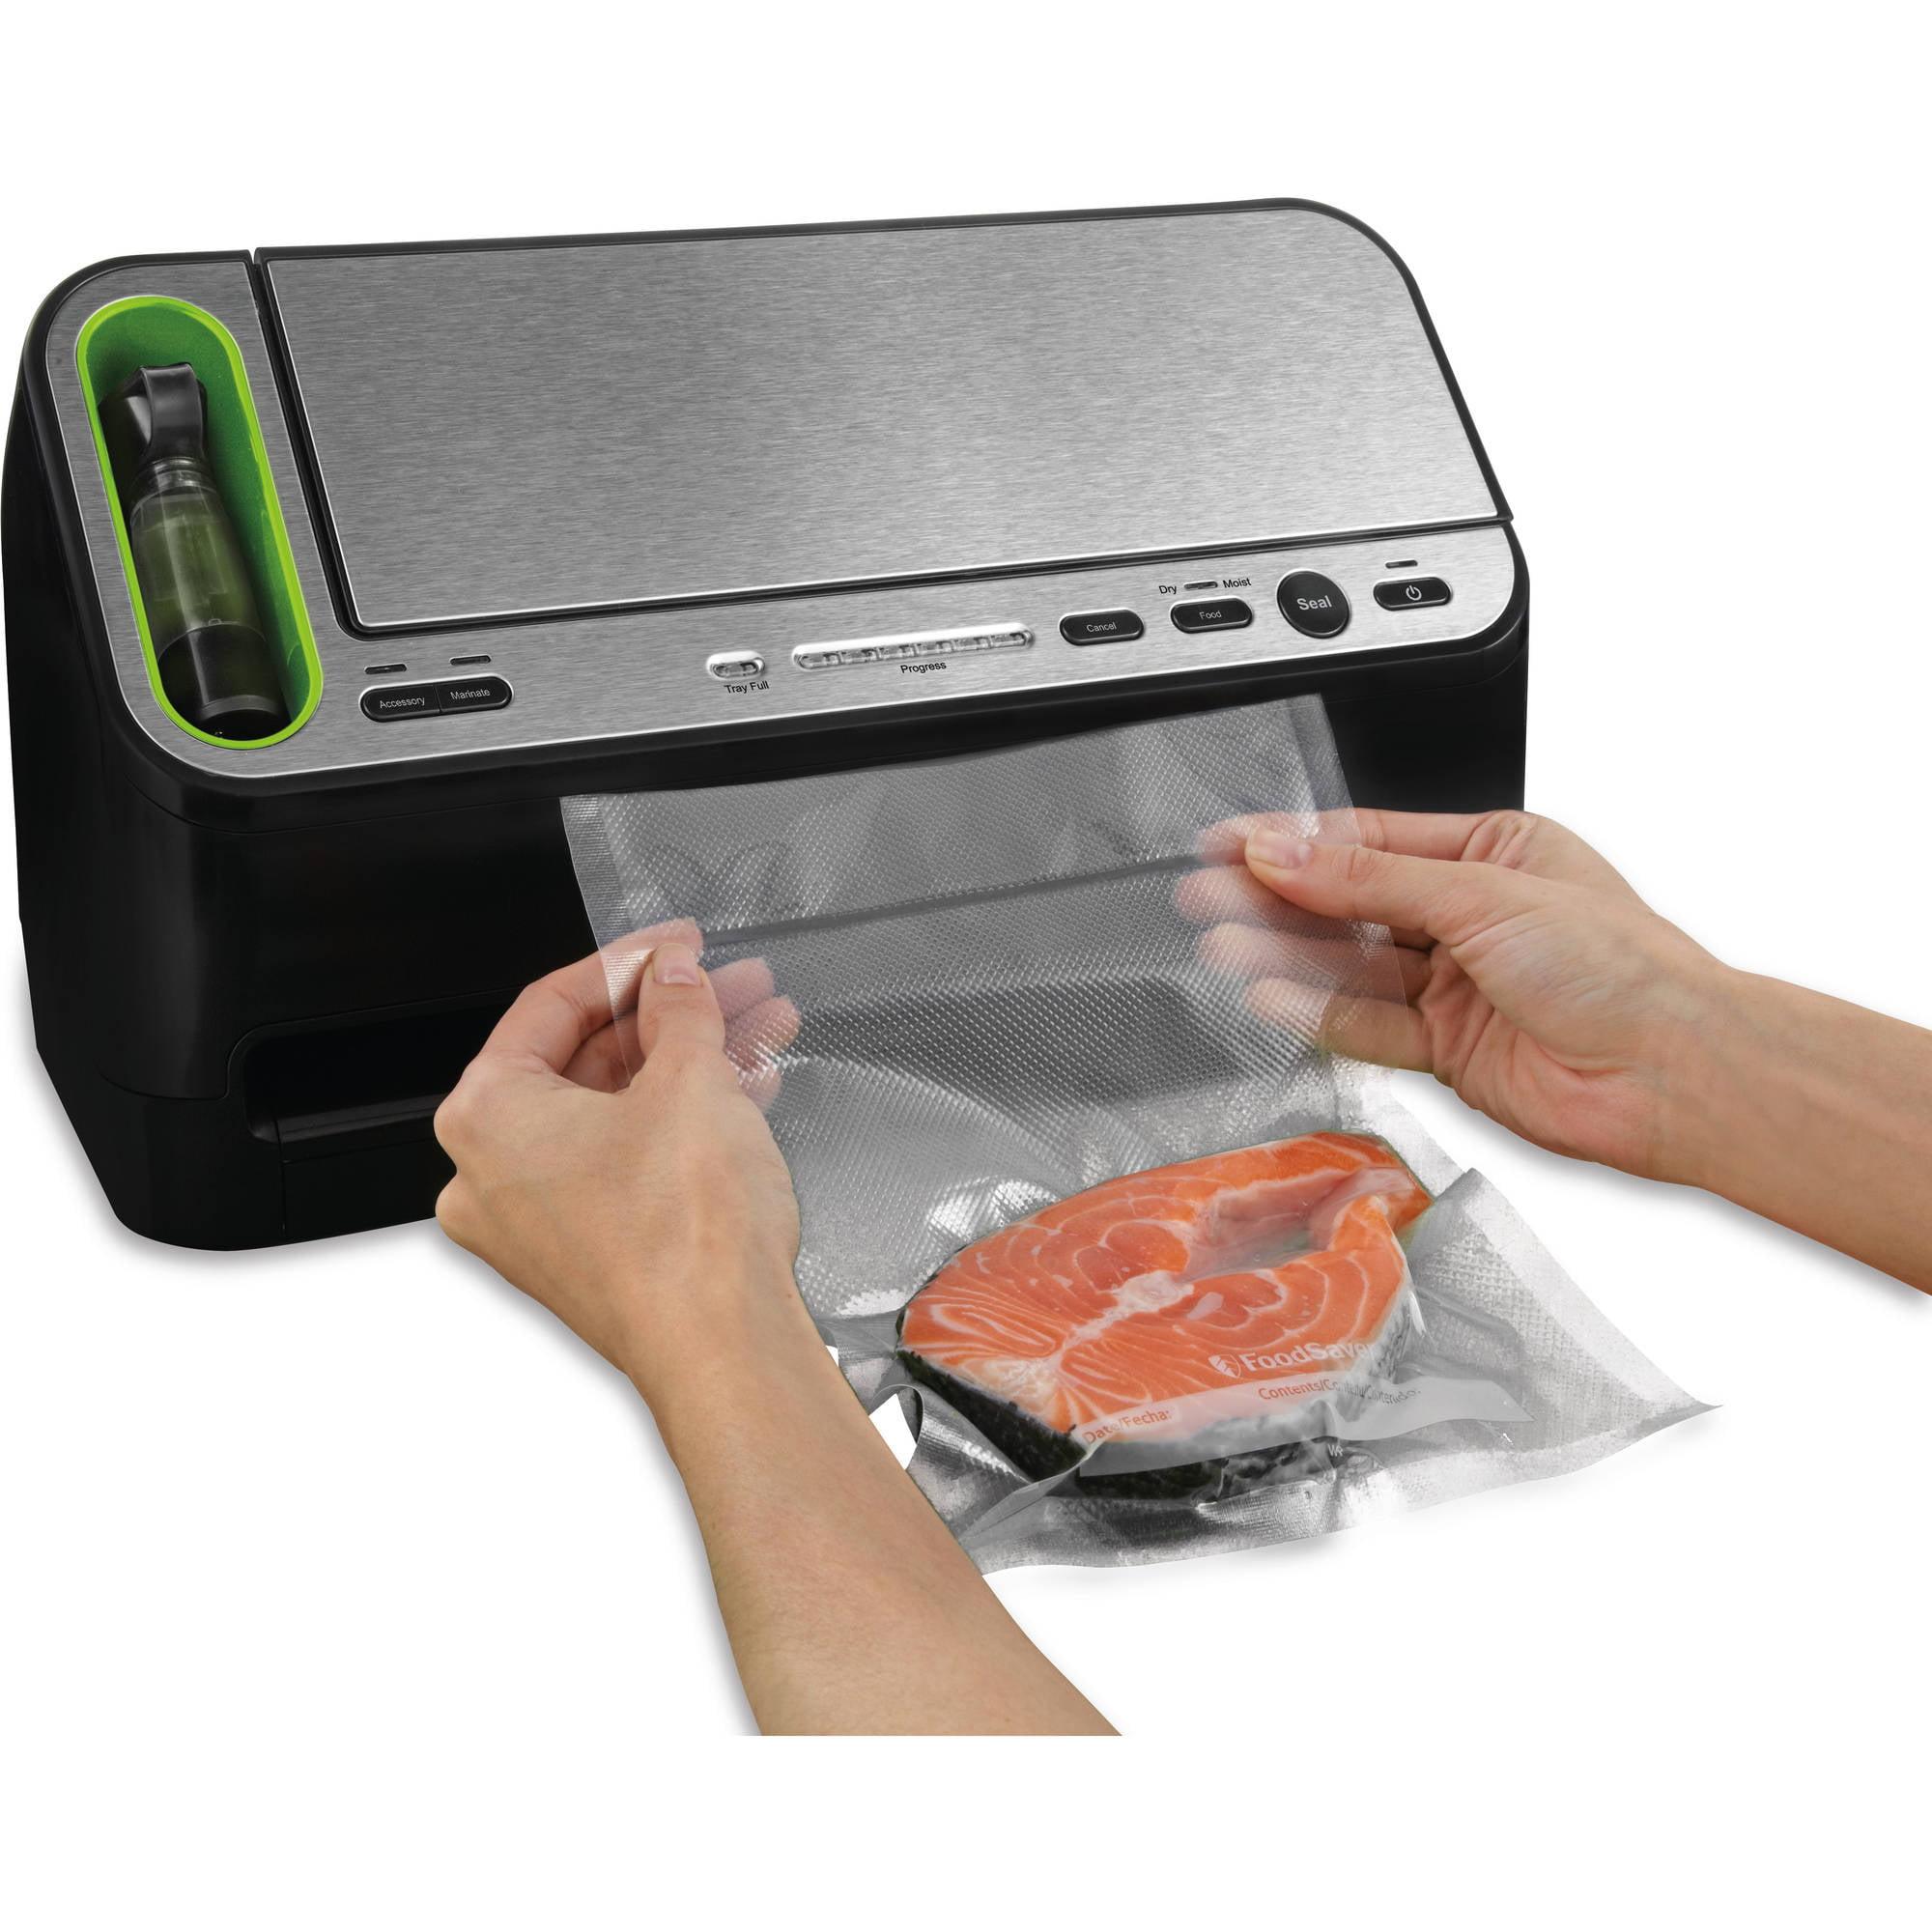 foodsaver vacuum sealer bo with freshsaver fsfssl4420 m15